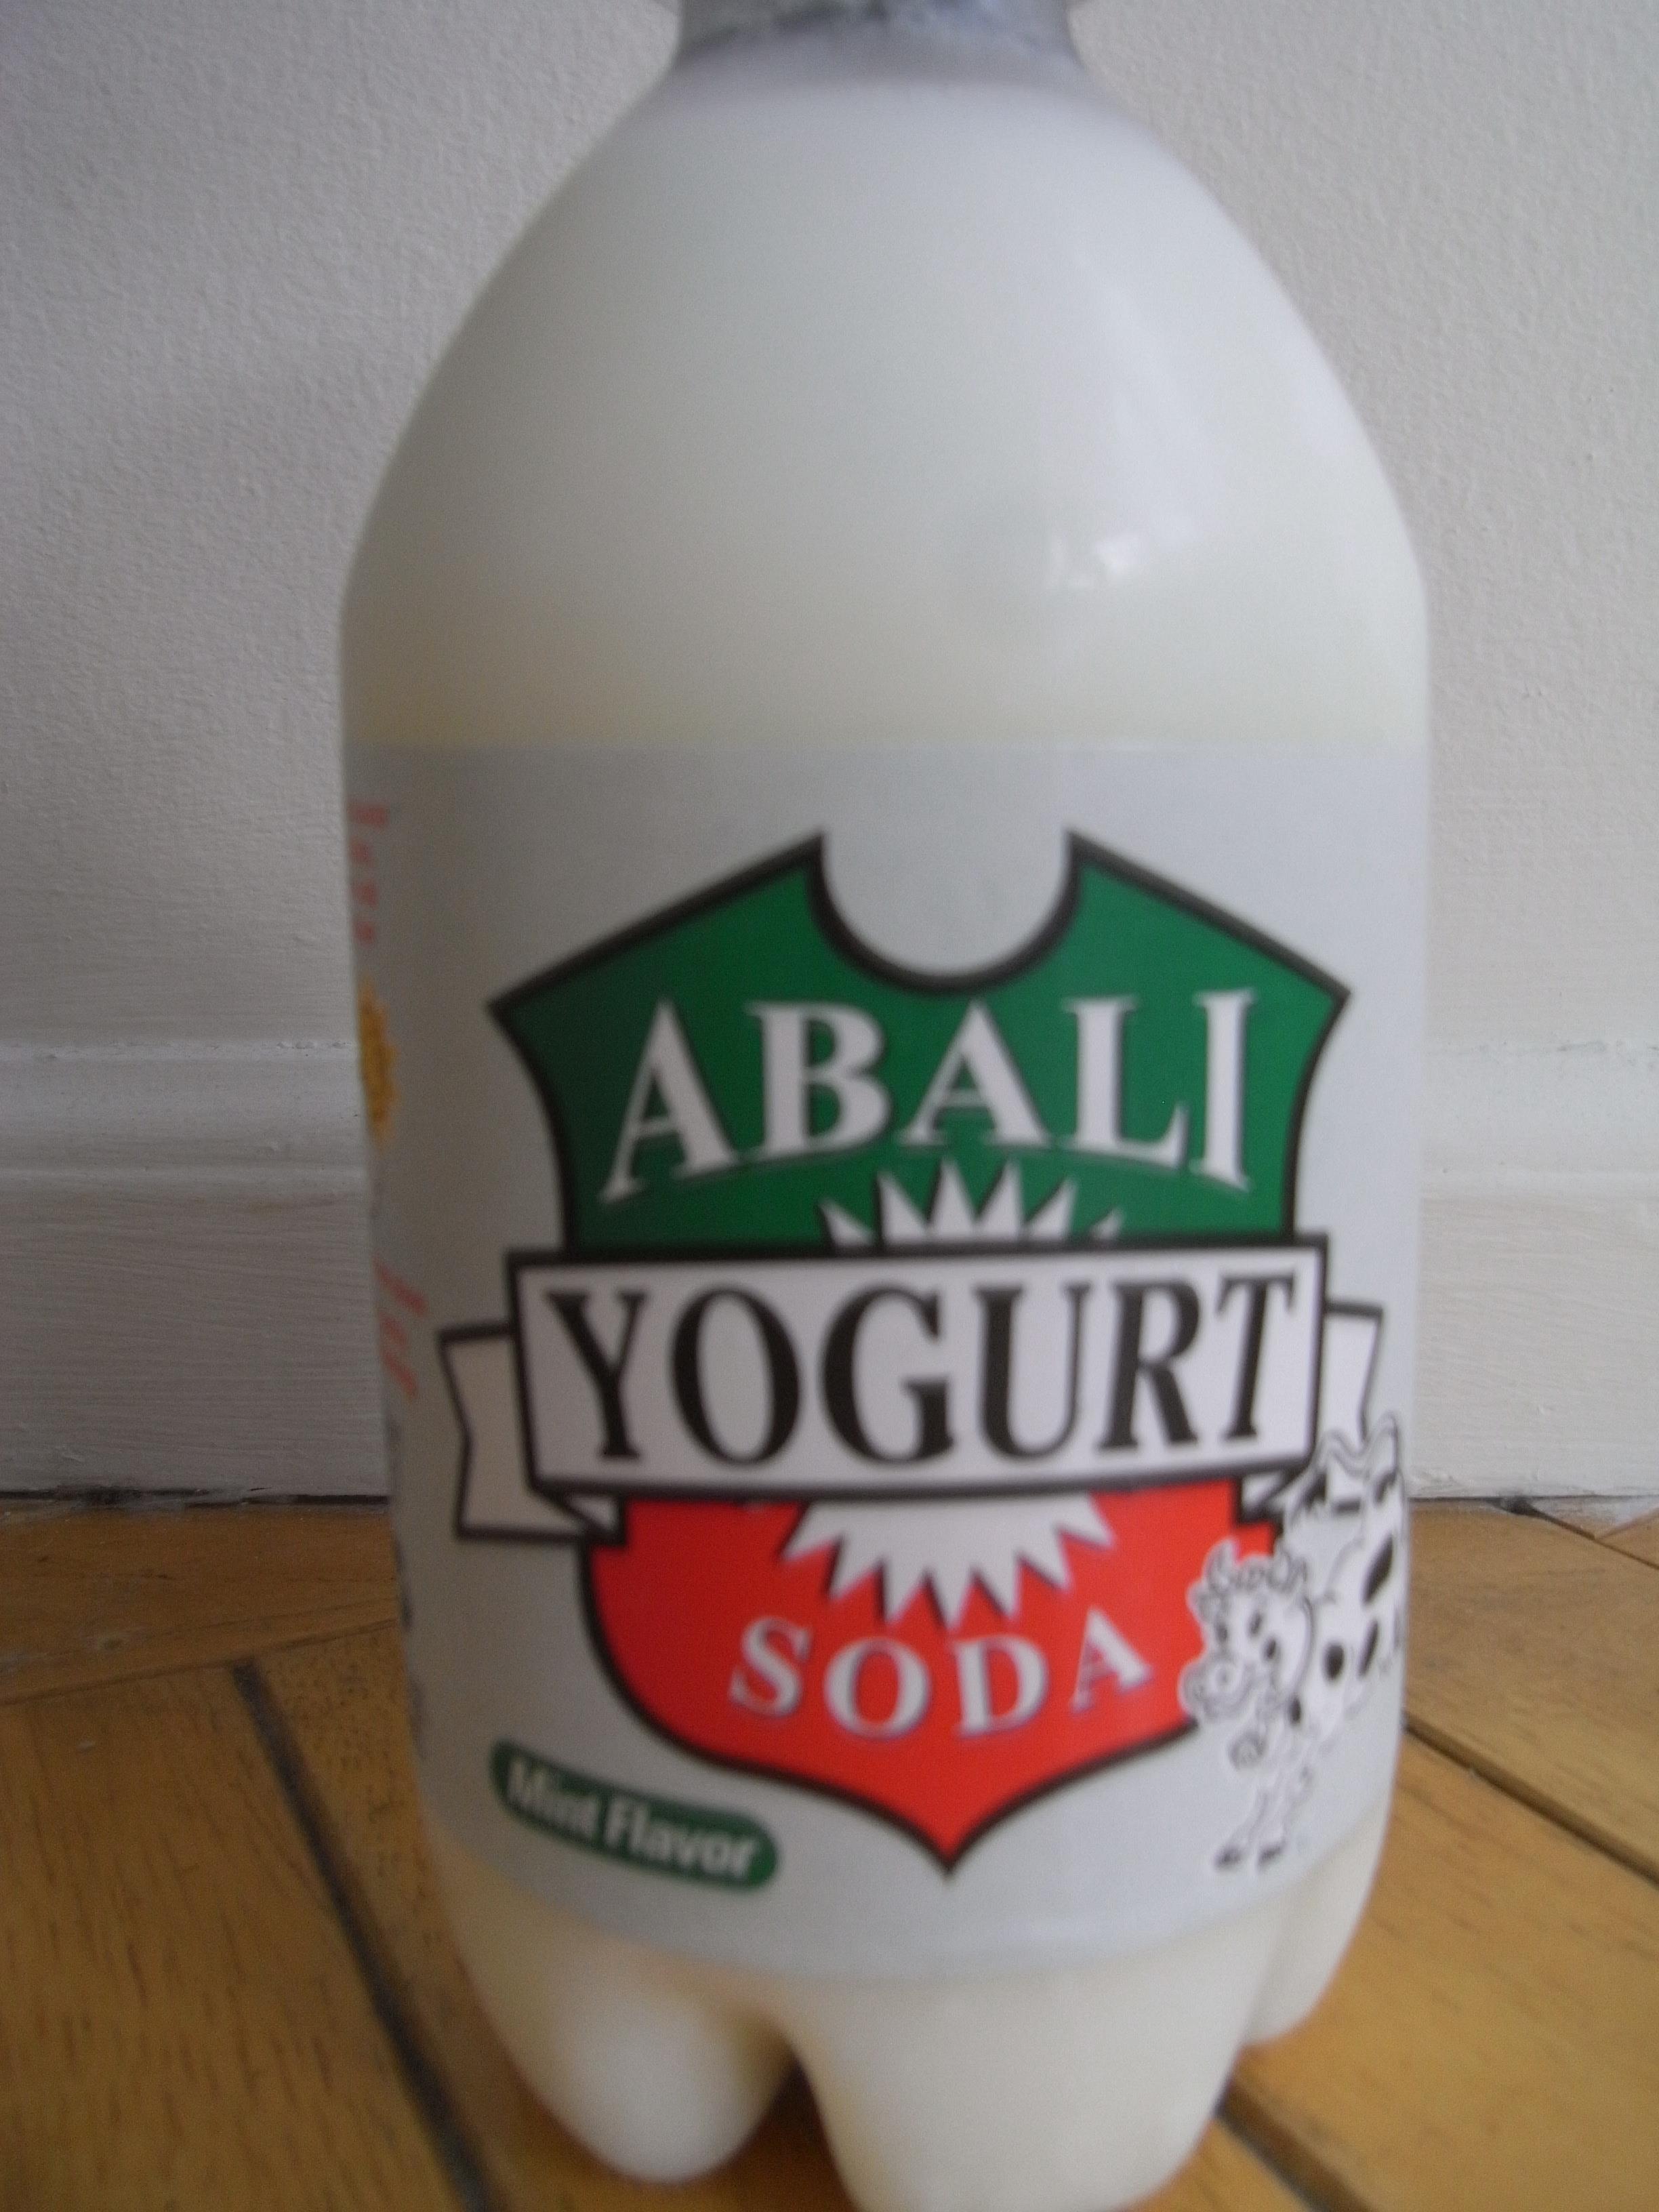 Abali yogurt soda ドゥーグ ミ...